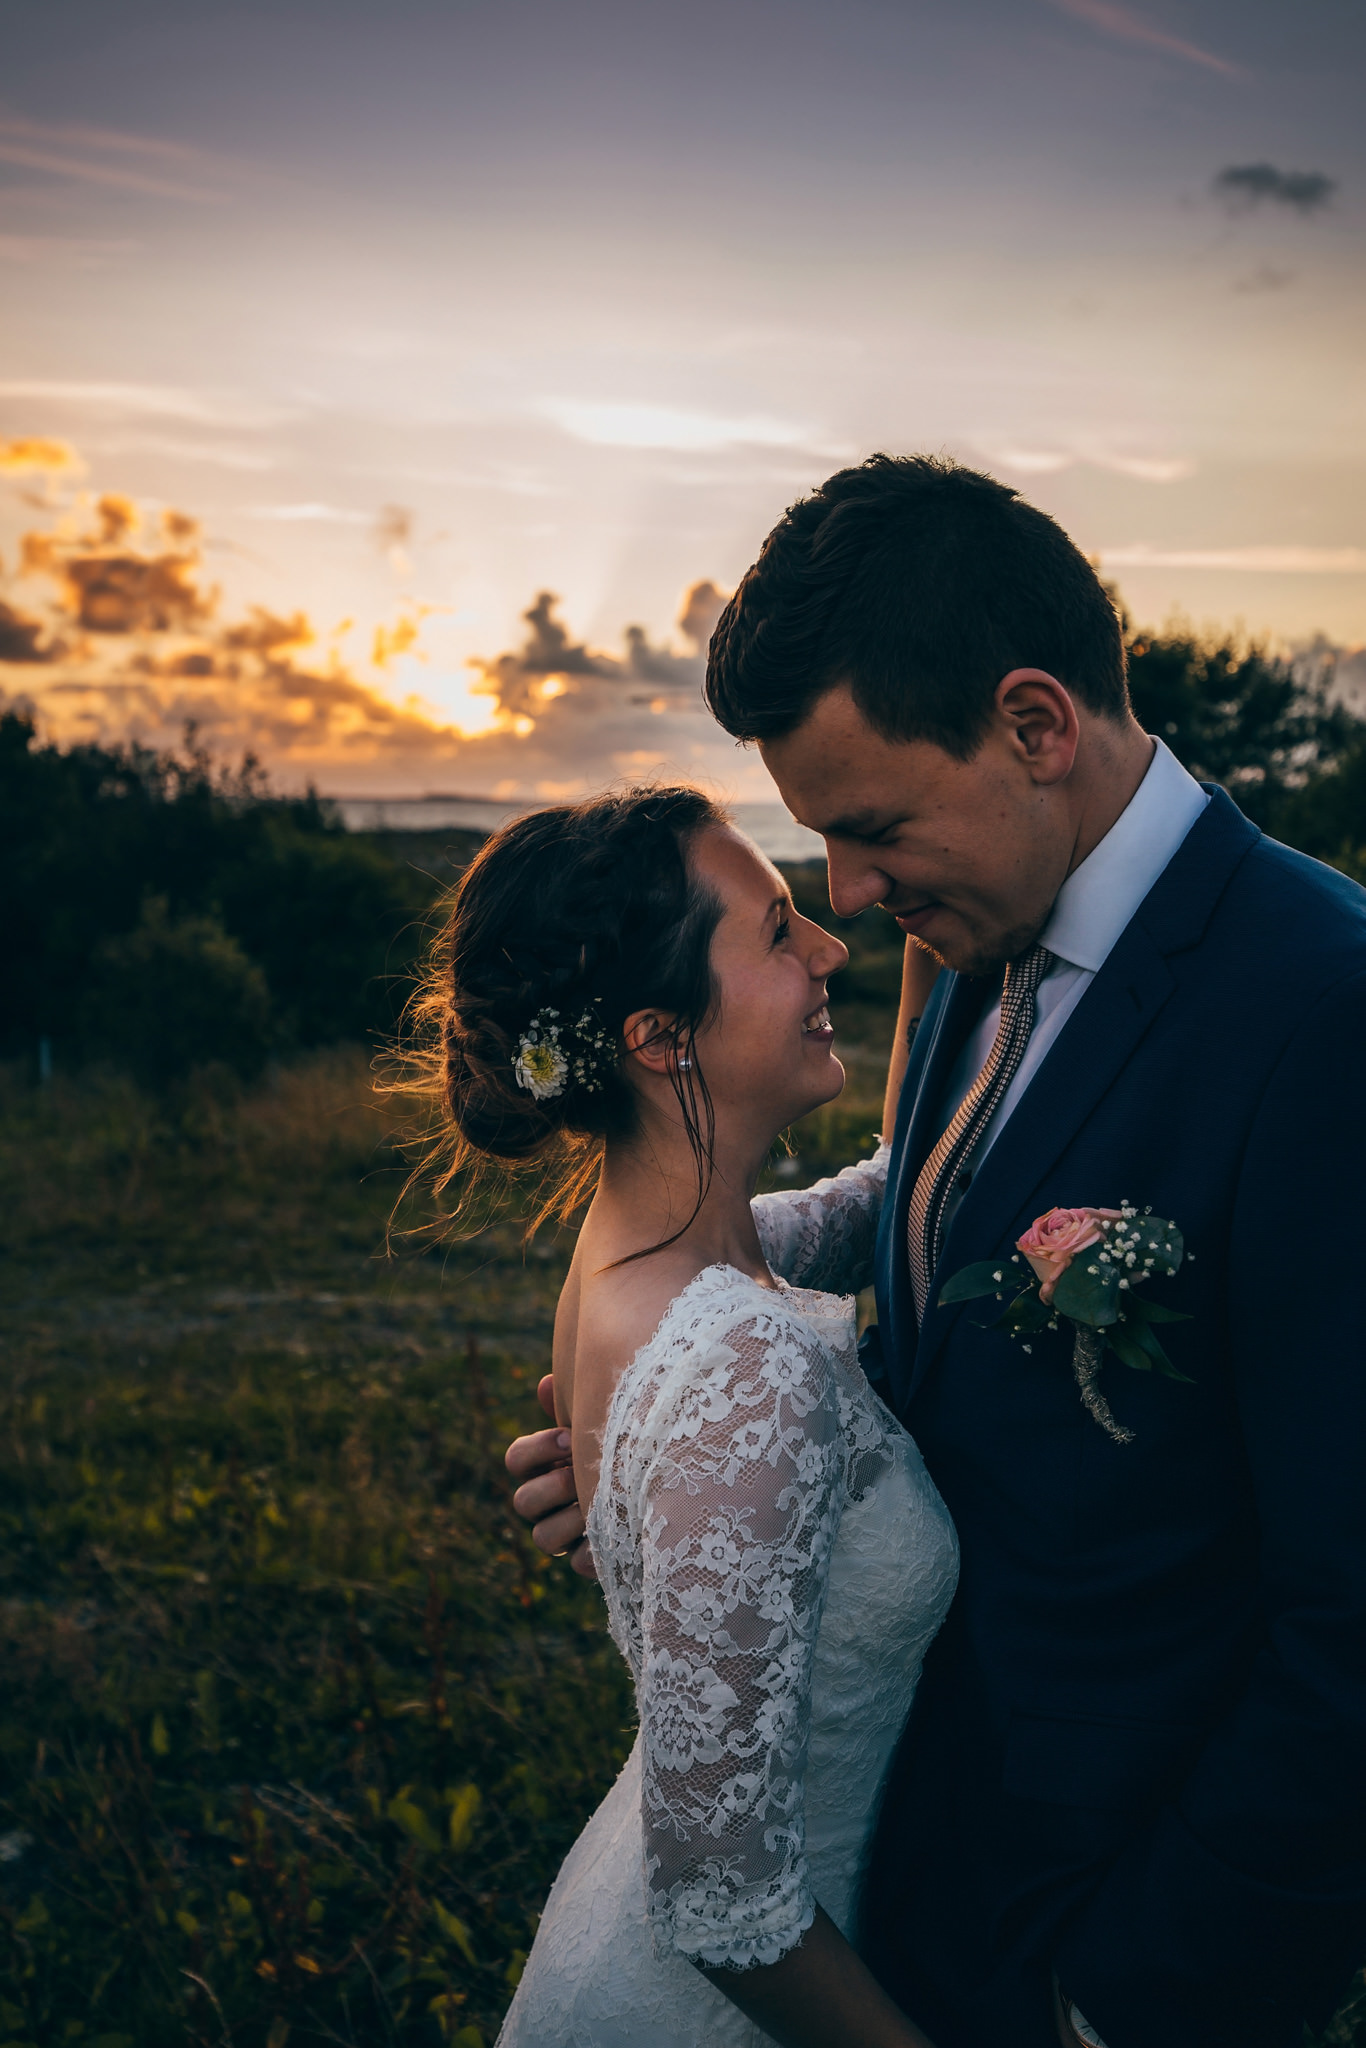 Norway+wedding+photographer+elopement+pre+wedding+Casey+Arneson-125.jpg